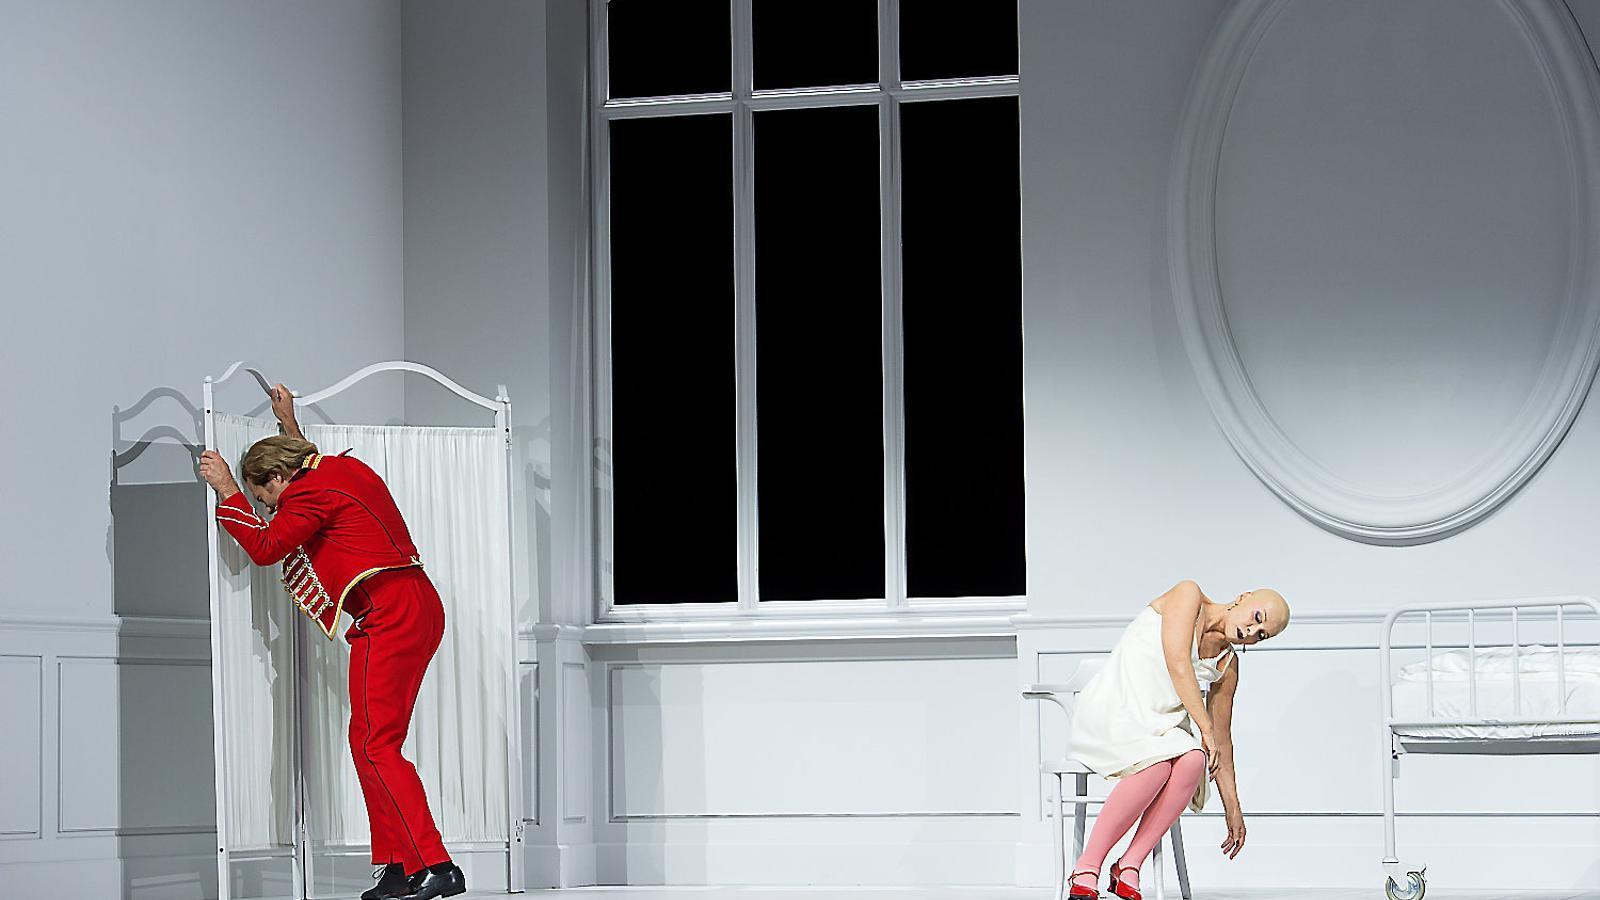 01. La confrontació entre la Comtessa i Hermann, una escena clau de La dama de piques. 02. Poppea i Neró a L'incoronazione di Poppea.